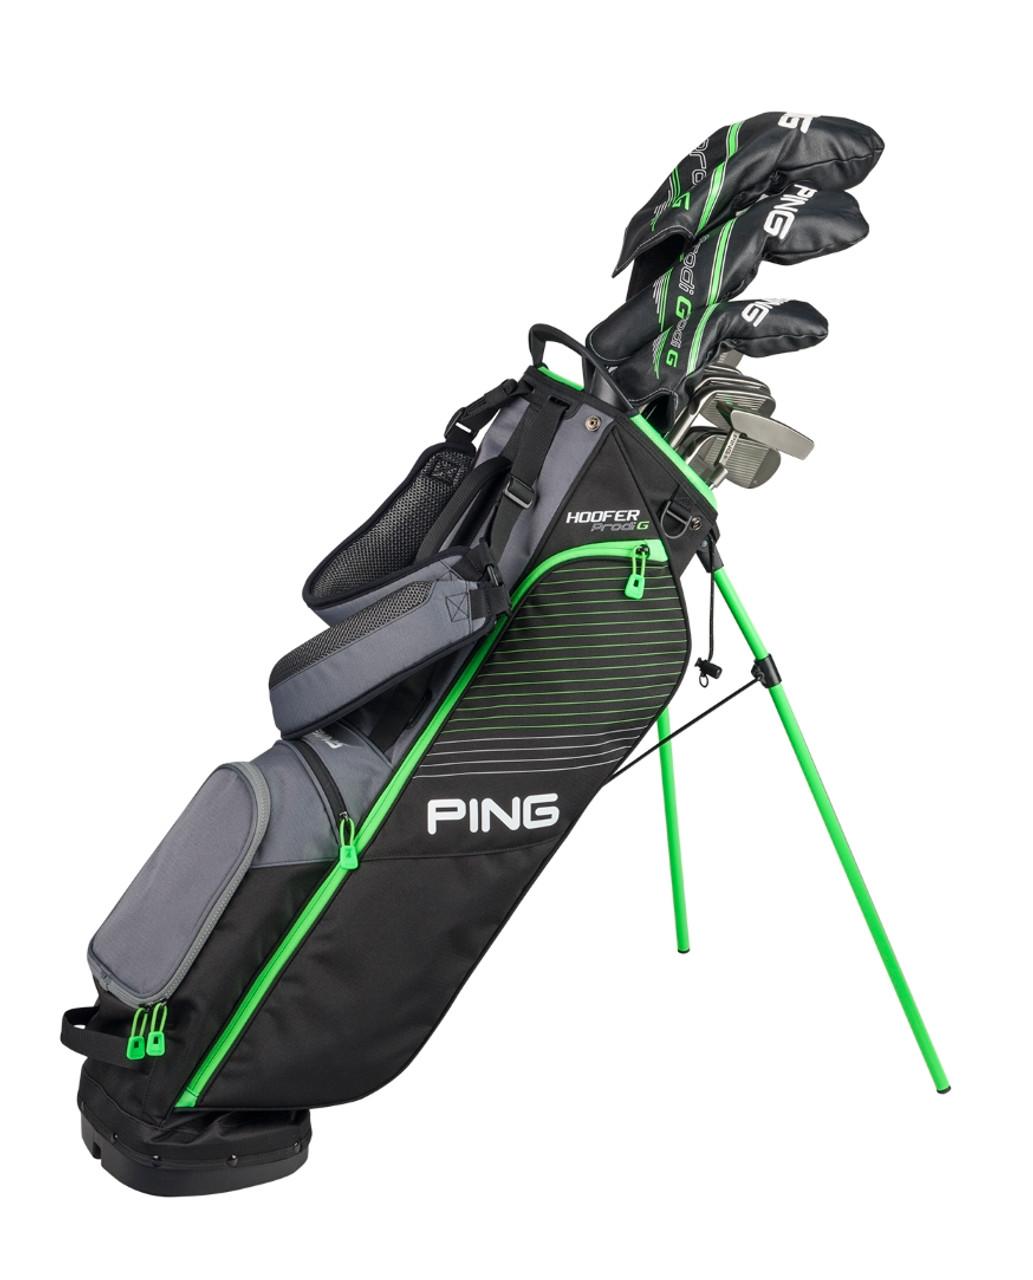 Ping Junior Prodi G Package N Set (7 Clubs   Bag) Multiple Lengths f076d3c9fbed2